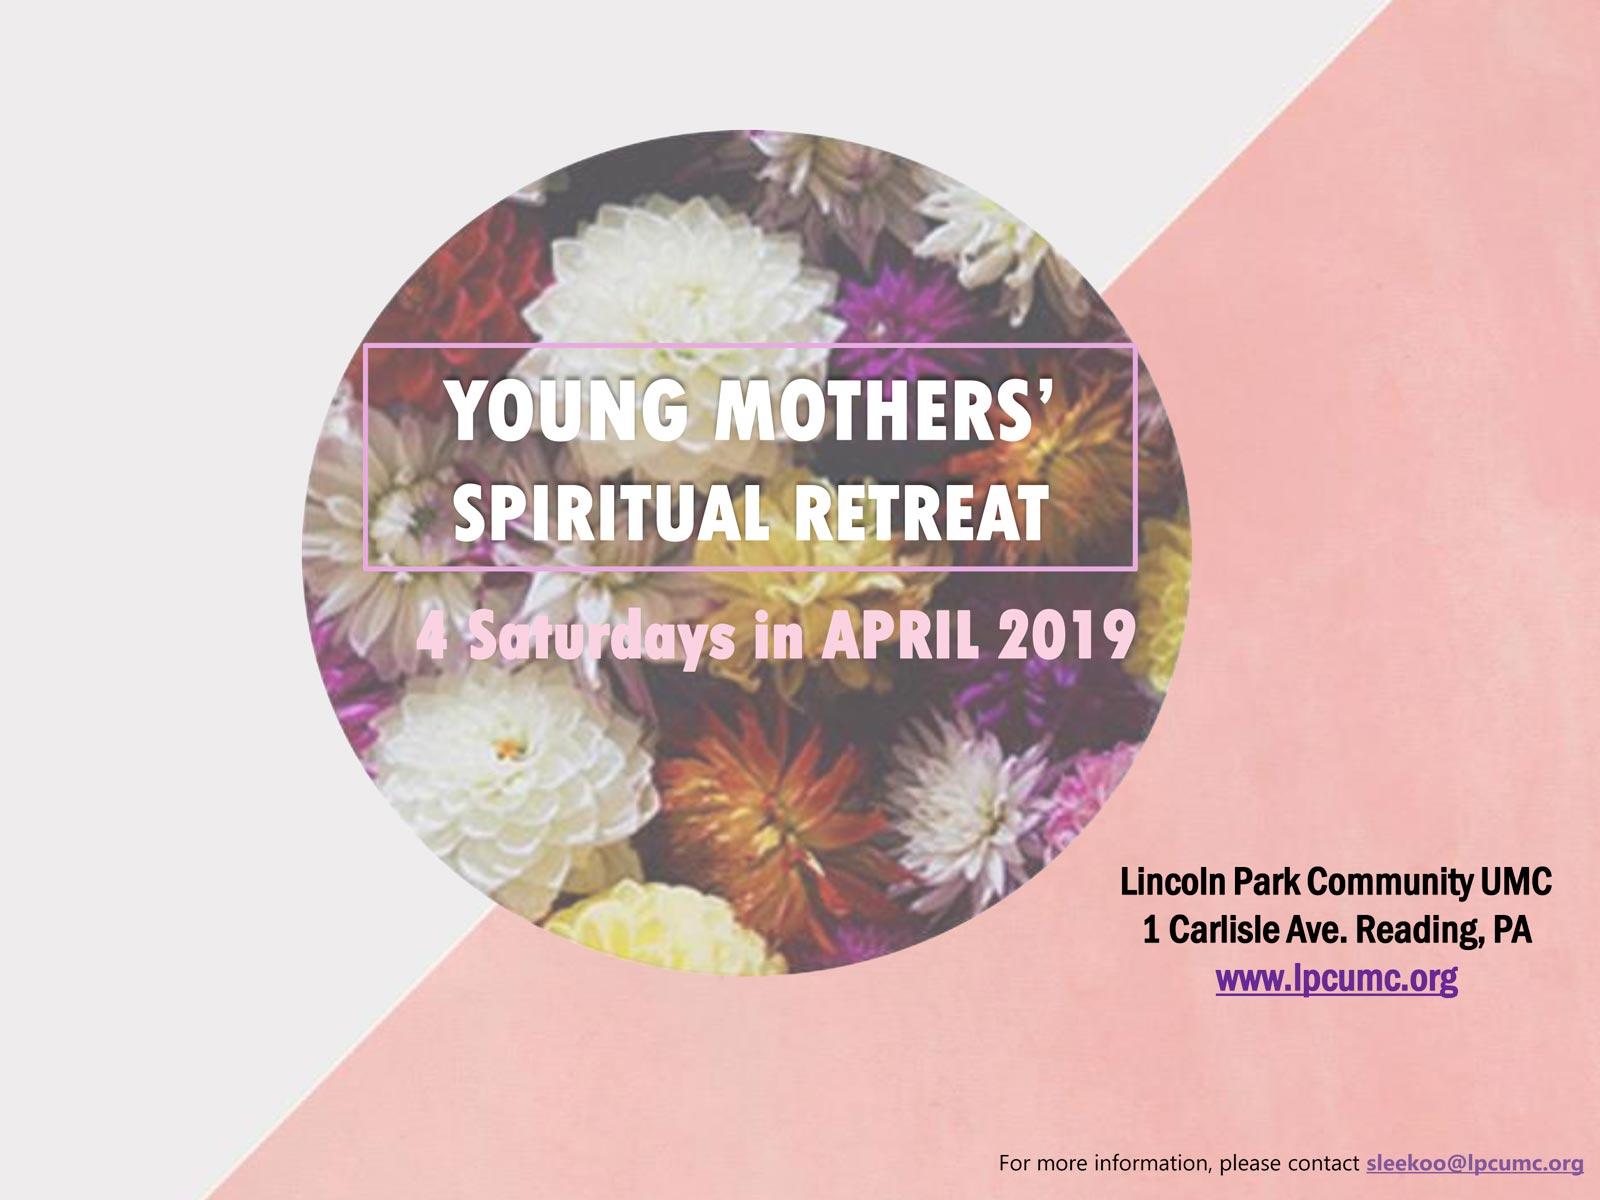 Young Mothers Spiritual Retreat